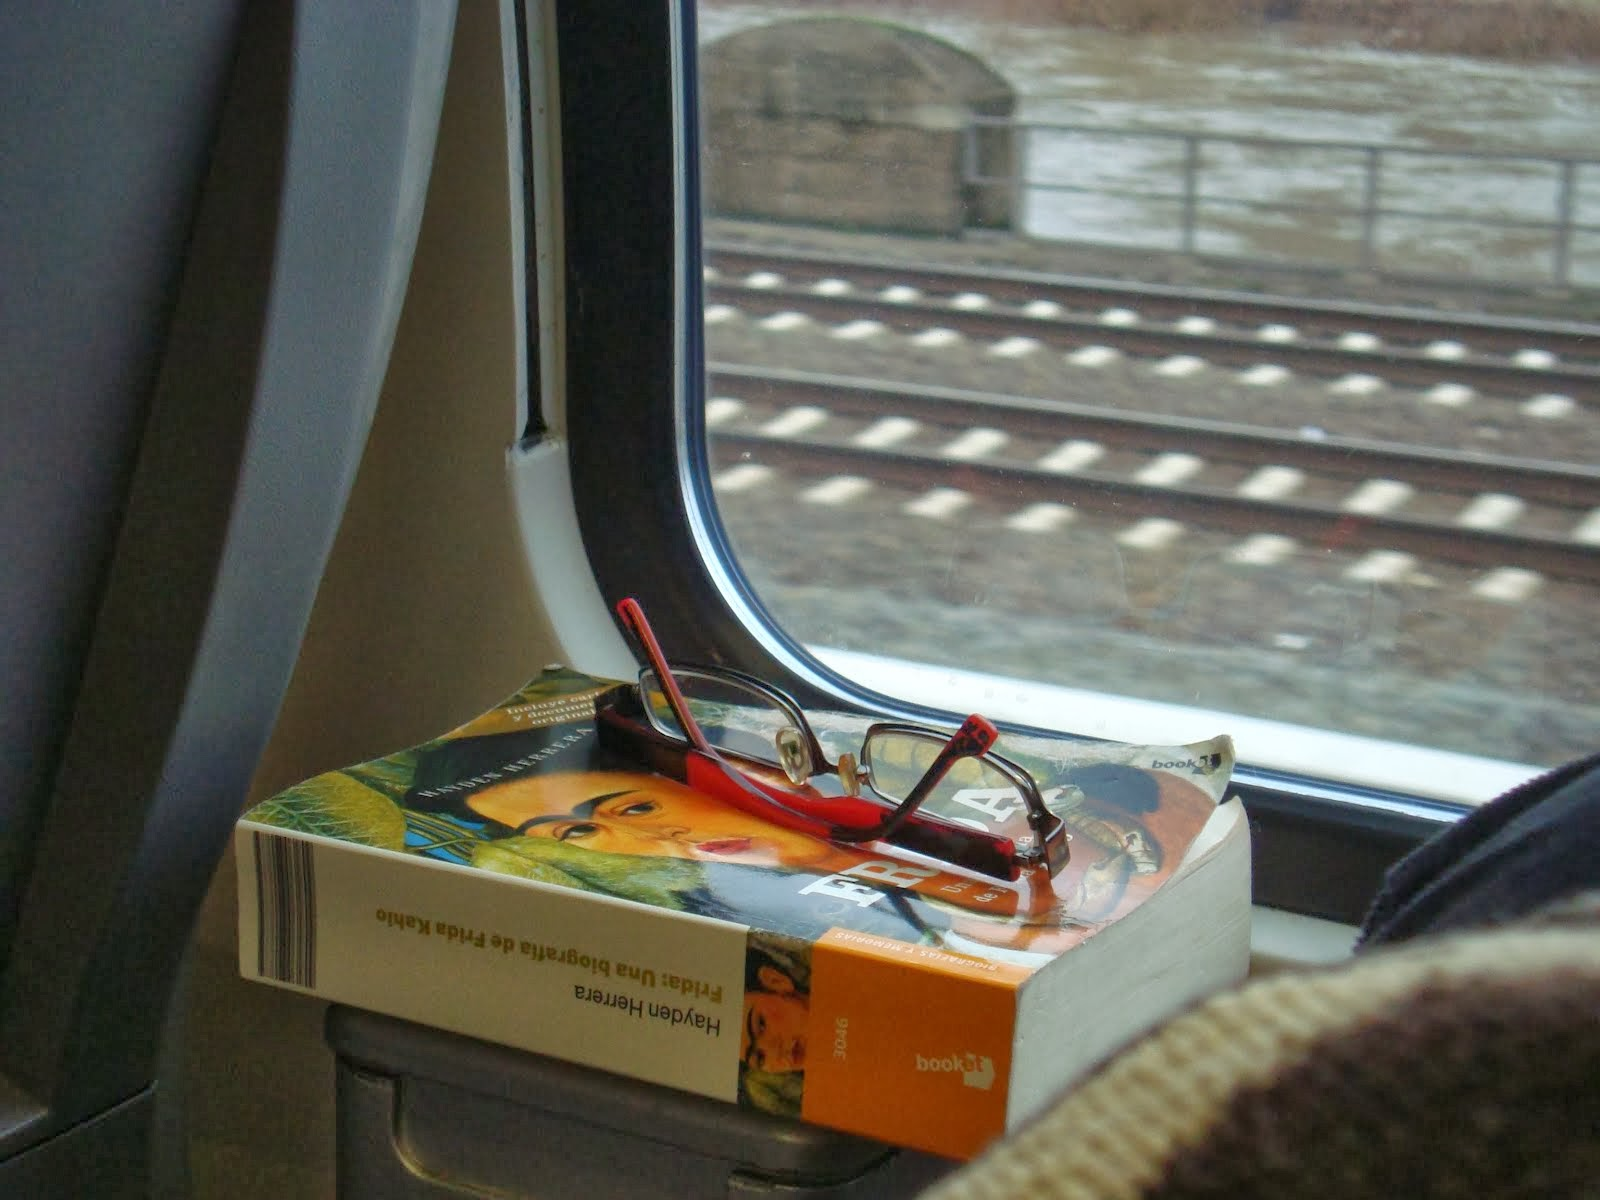 Devenires y trenes